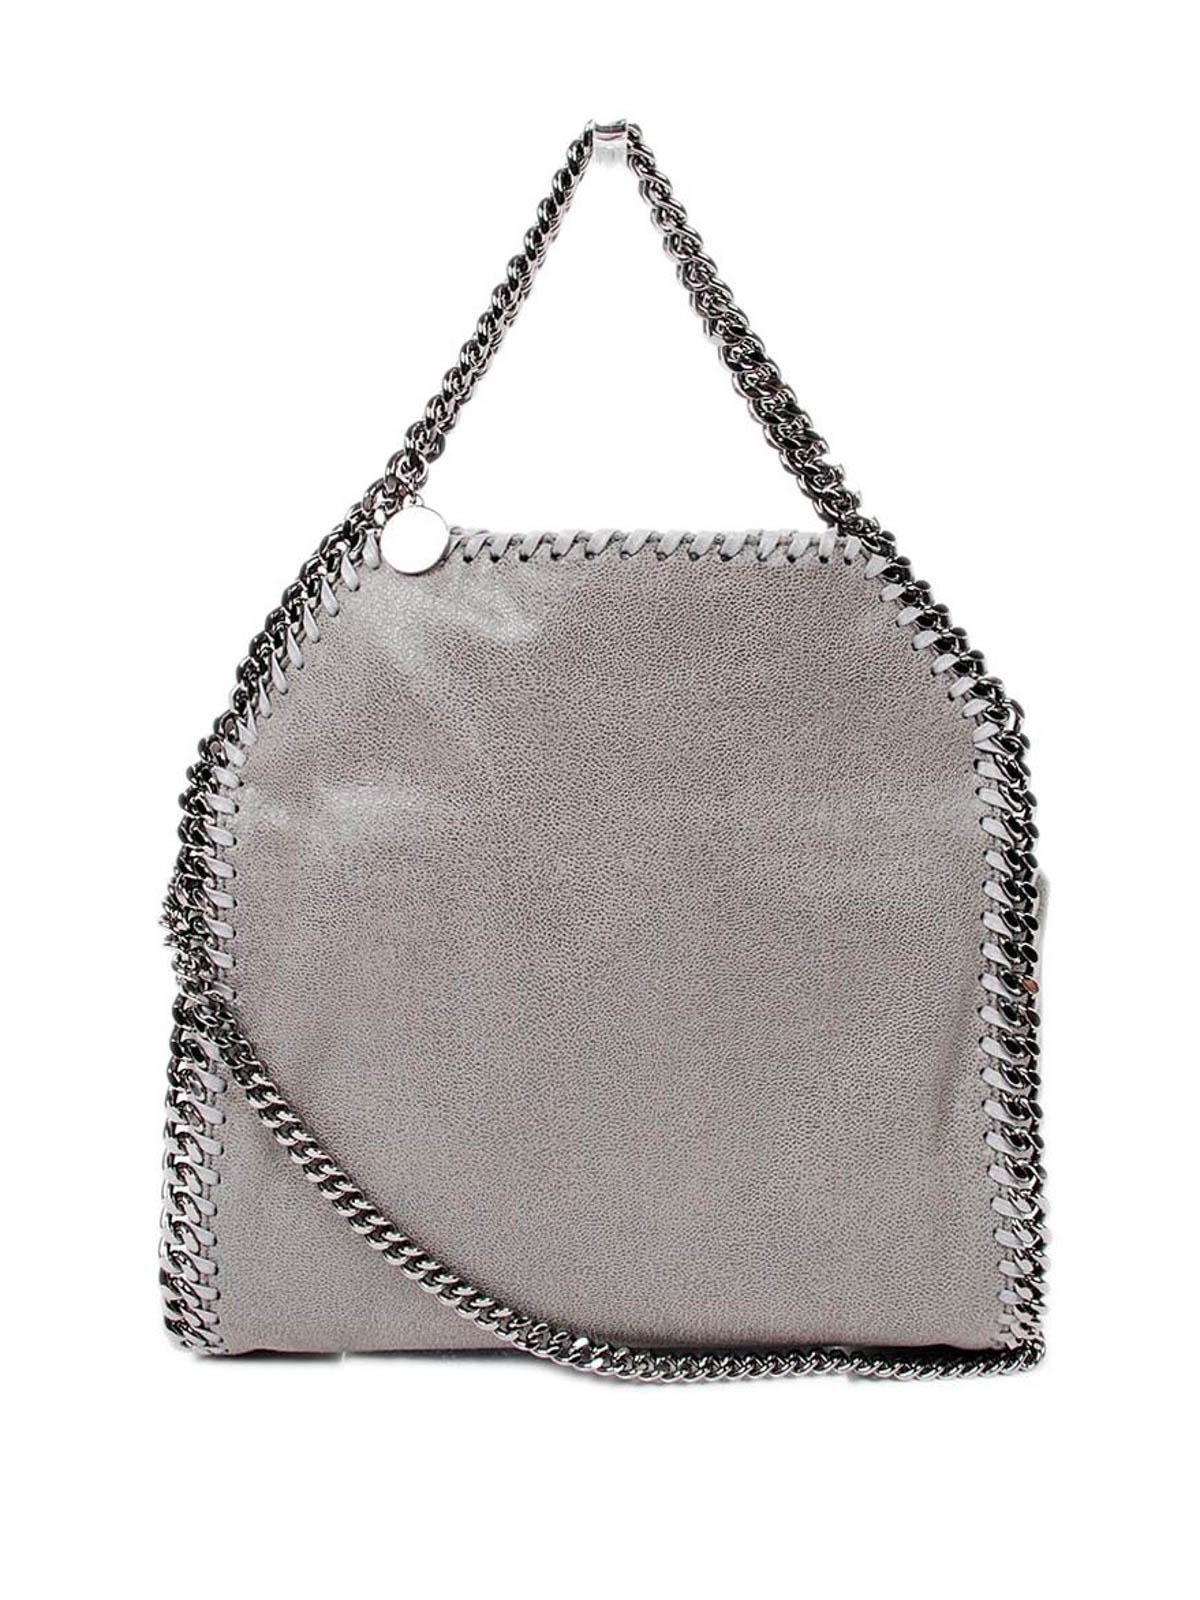 stella mccartney falabella mini tote totes bags 371223w91321220. Black Bedroom Furniture Sets. Home Design Ideas